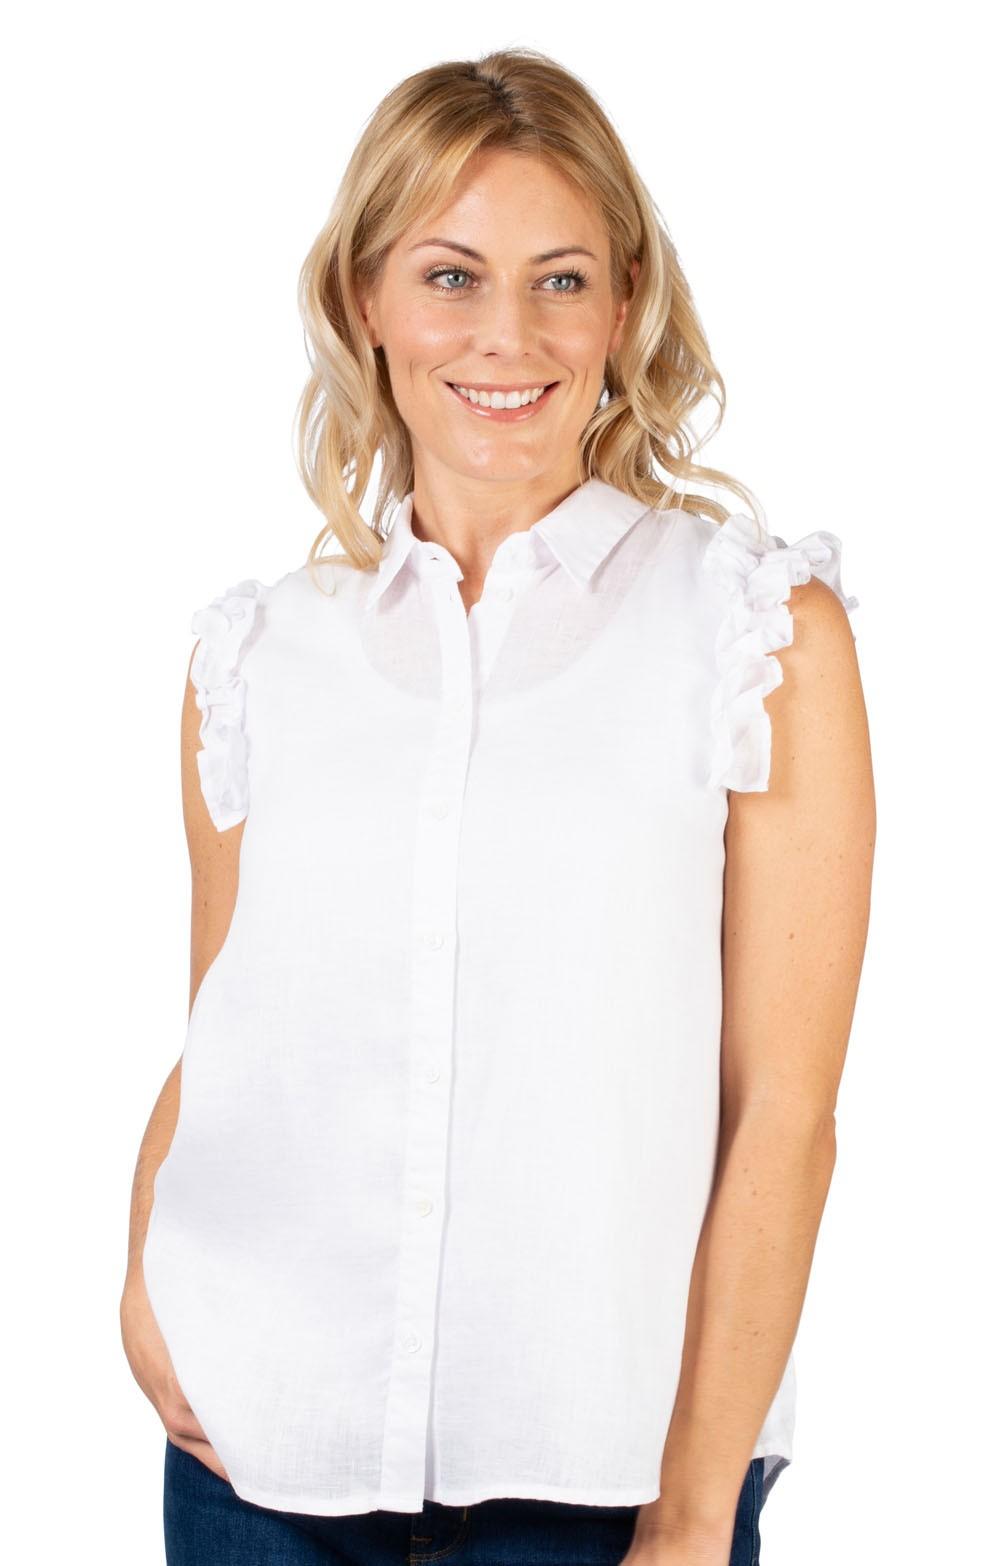 c8dcc2170f6819 Ladies Seidensticker Sleeveless Ruffle Shirt - House of Bruar